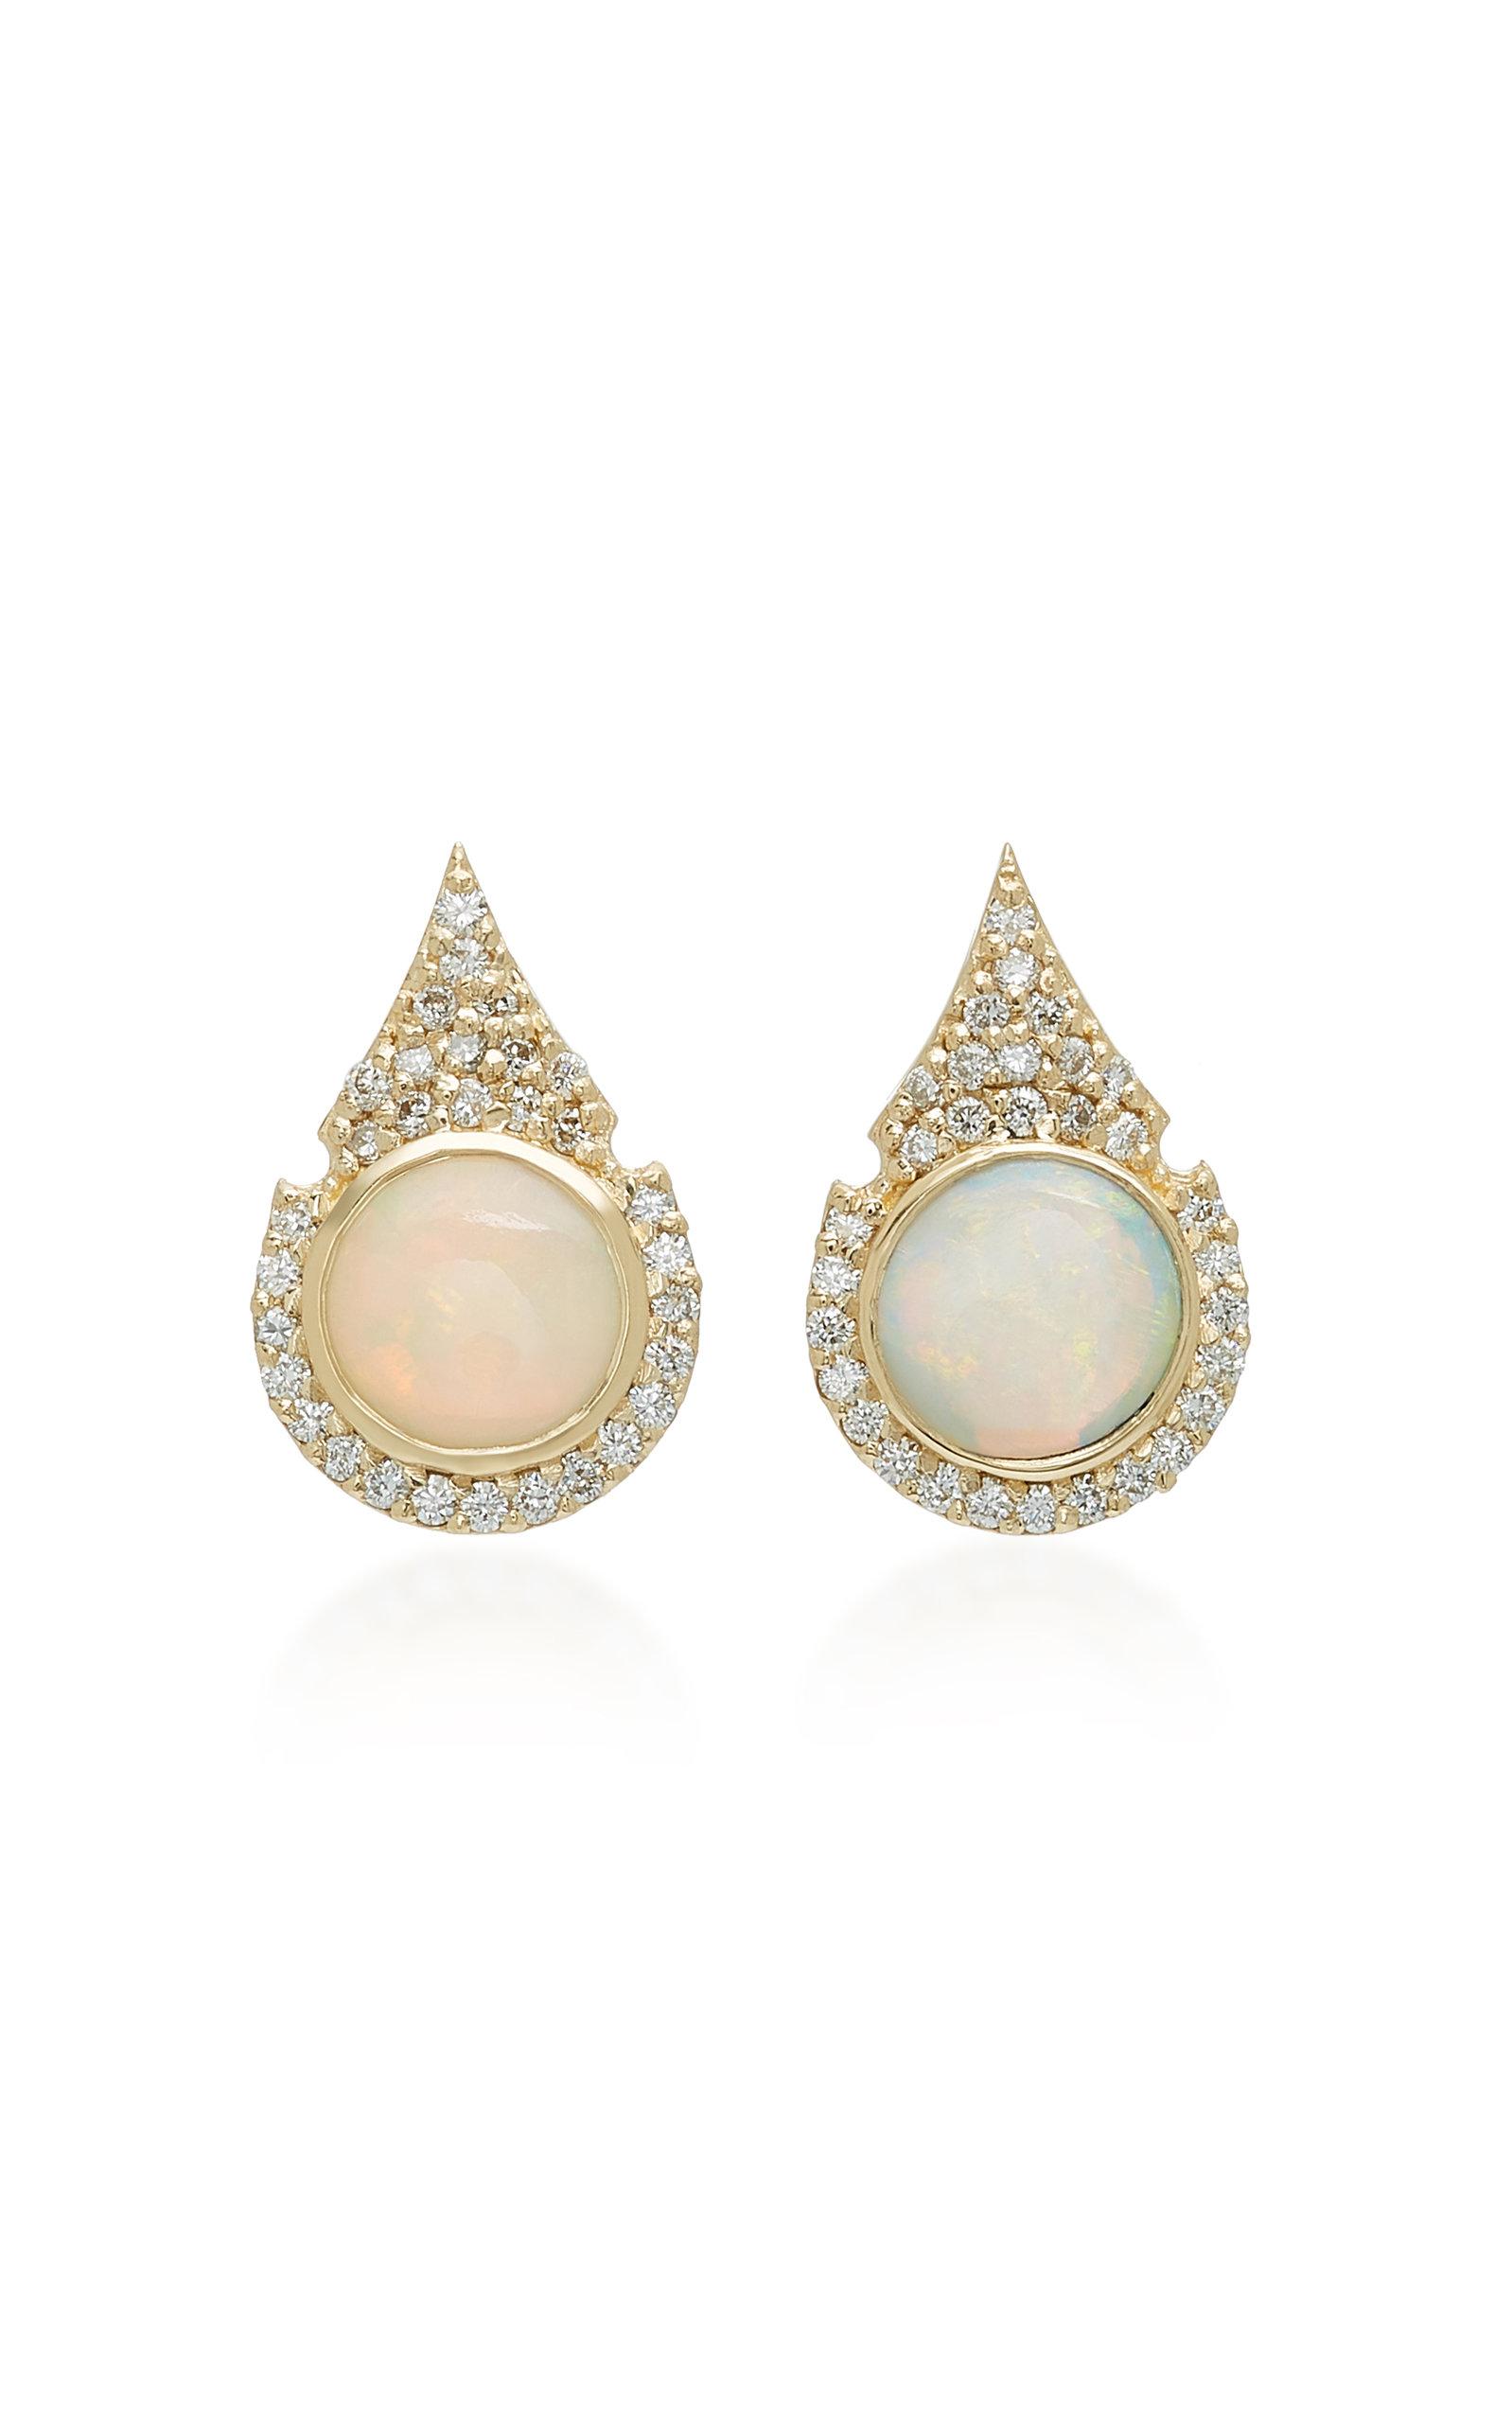 ILANA ARIEL Aziza 14K Gold Opal And Diamond Earrings in White